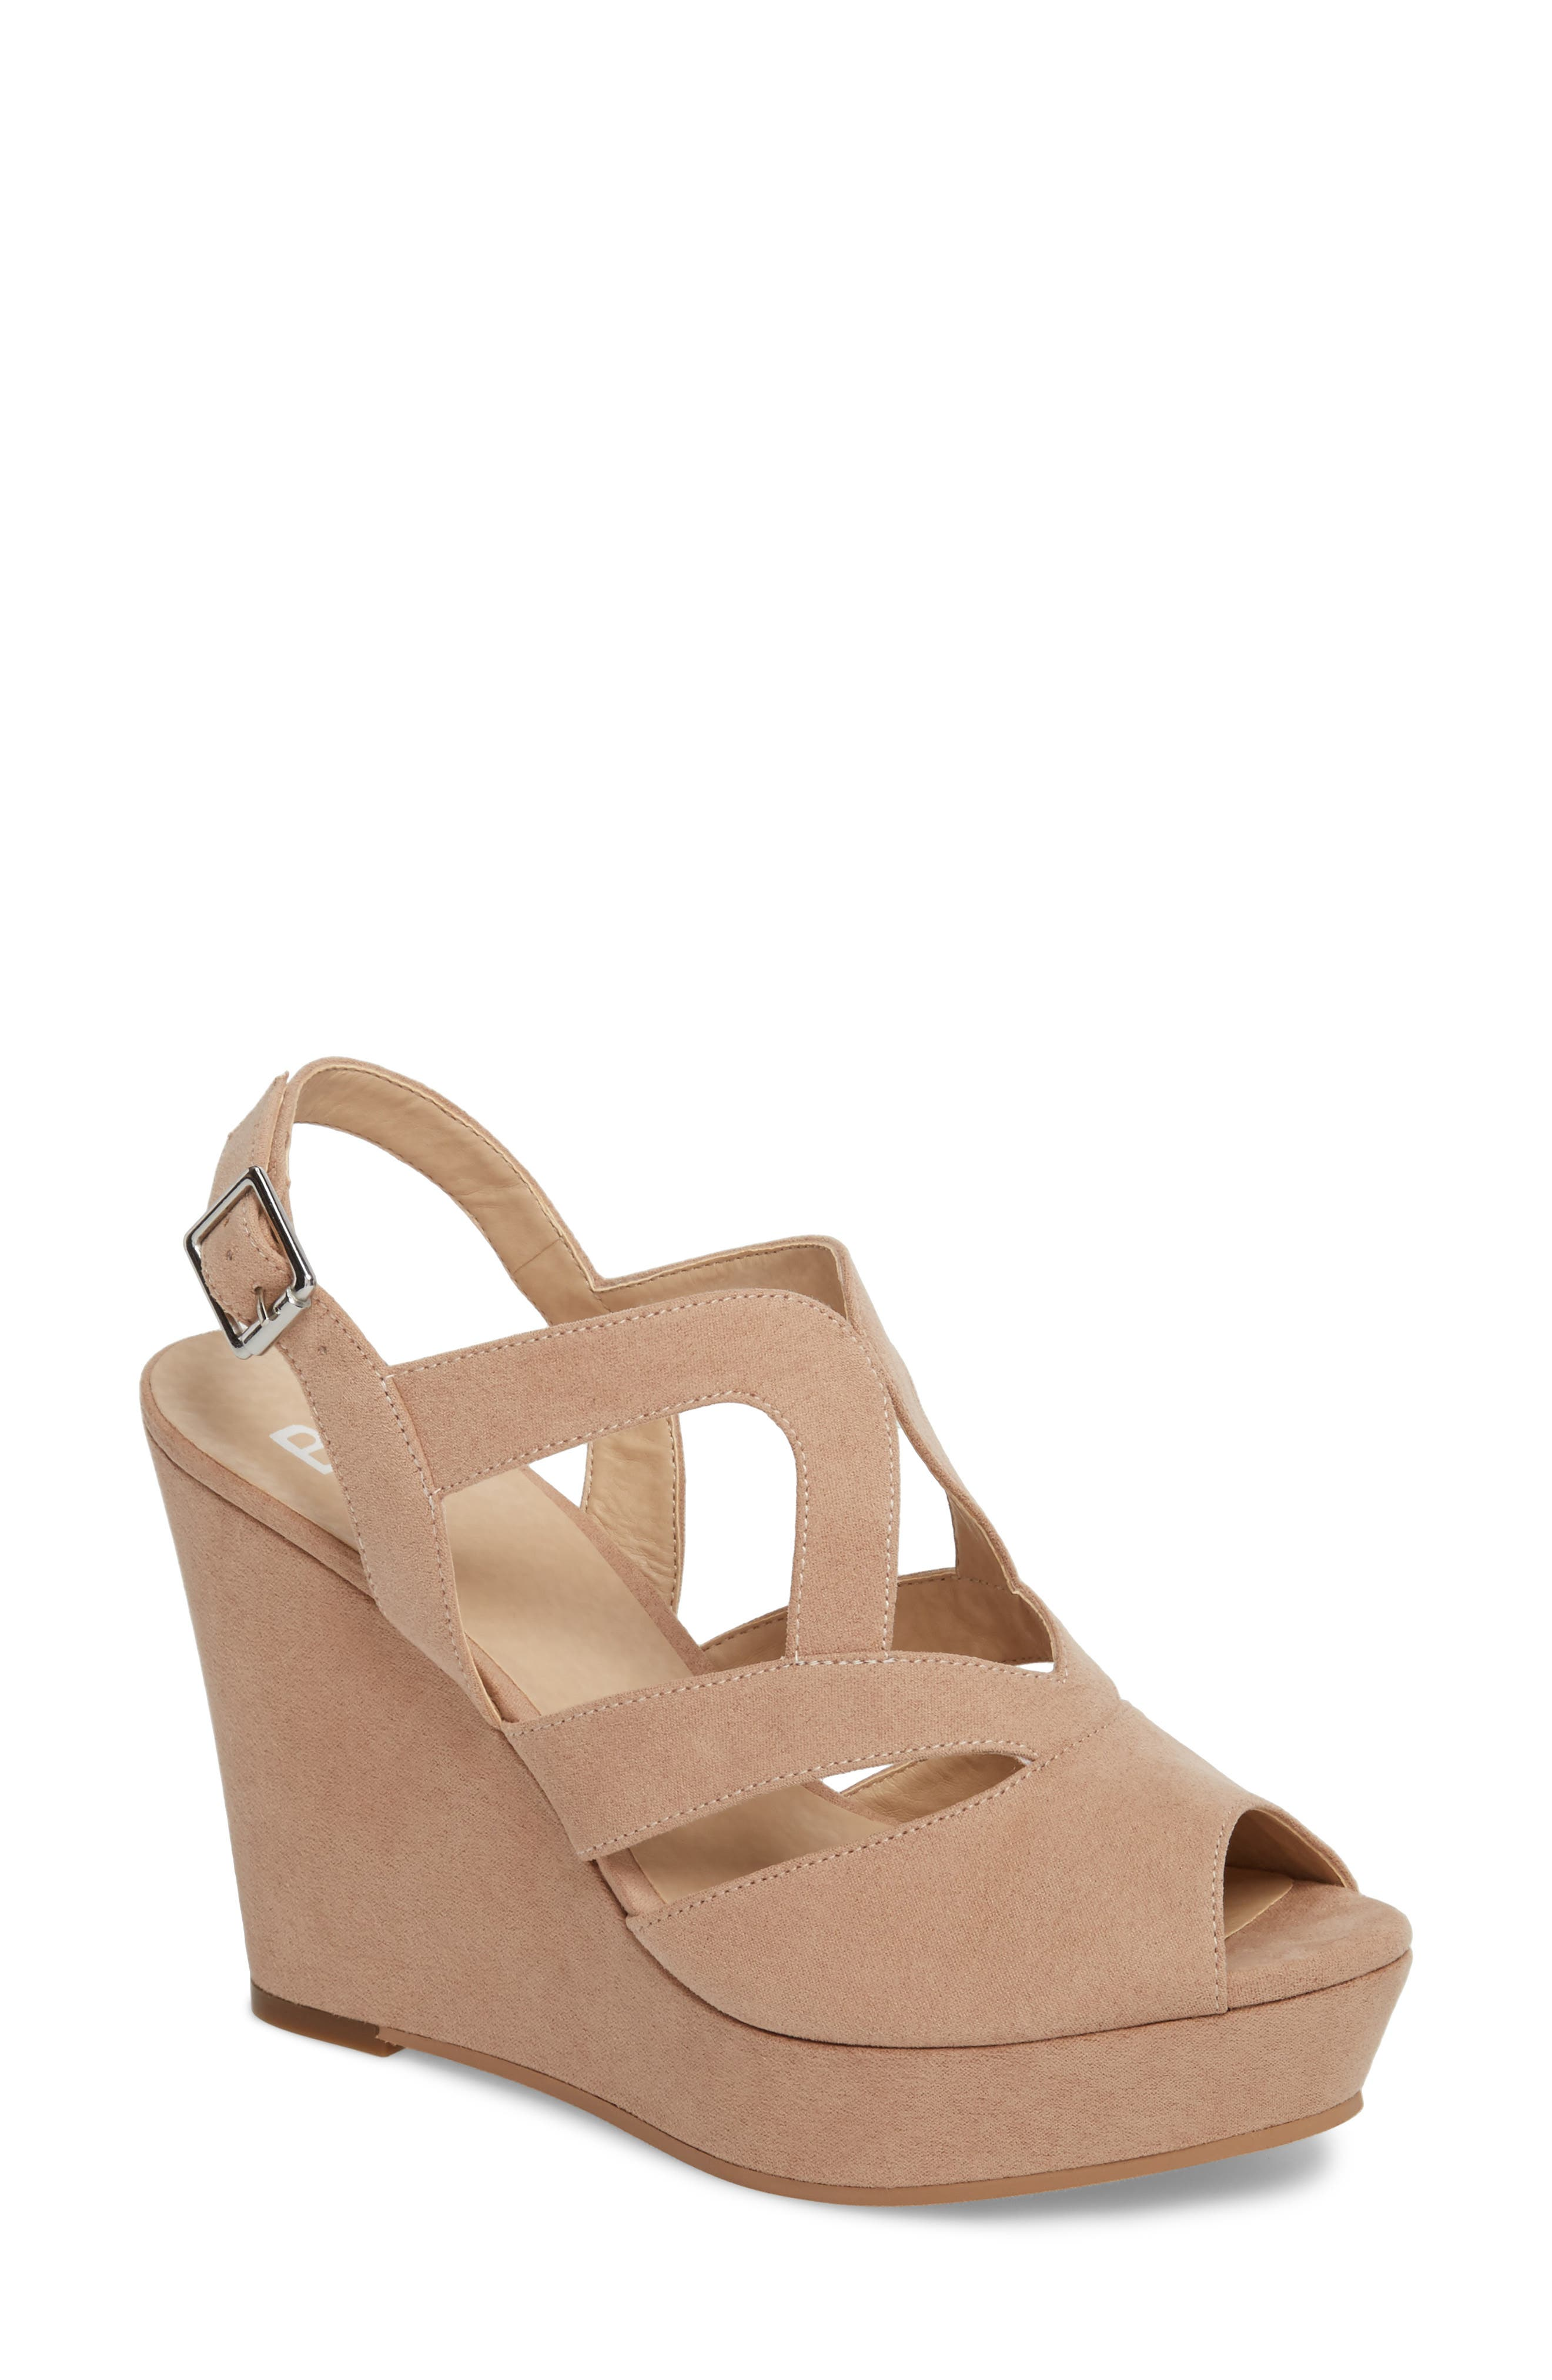 Sunny Platform Wedge Sandal,                             Main thumbnail 5, color,